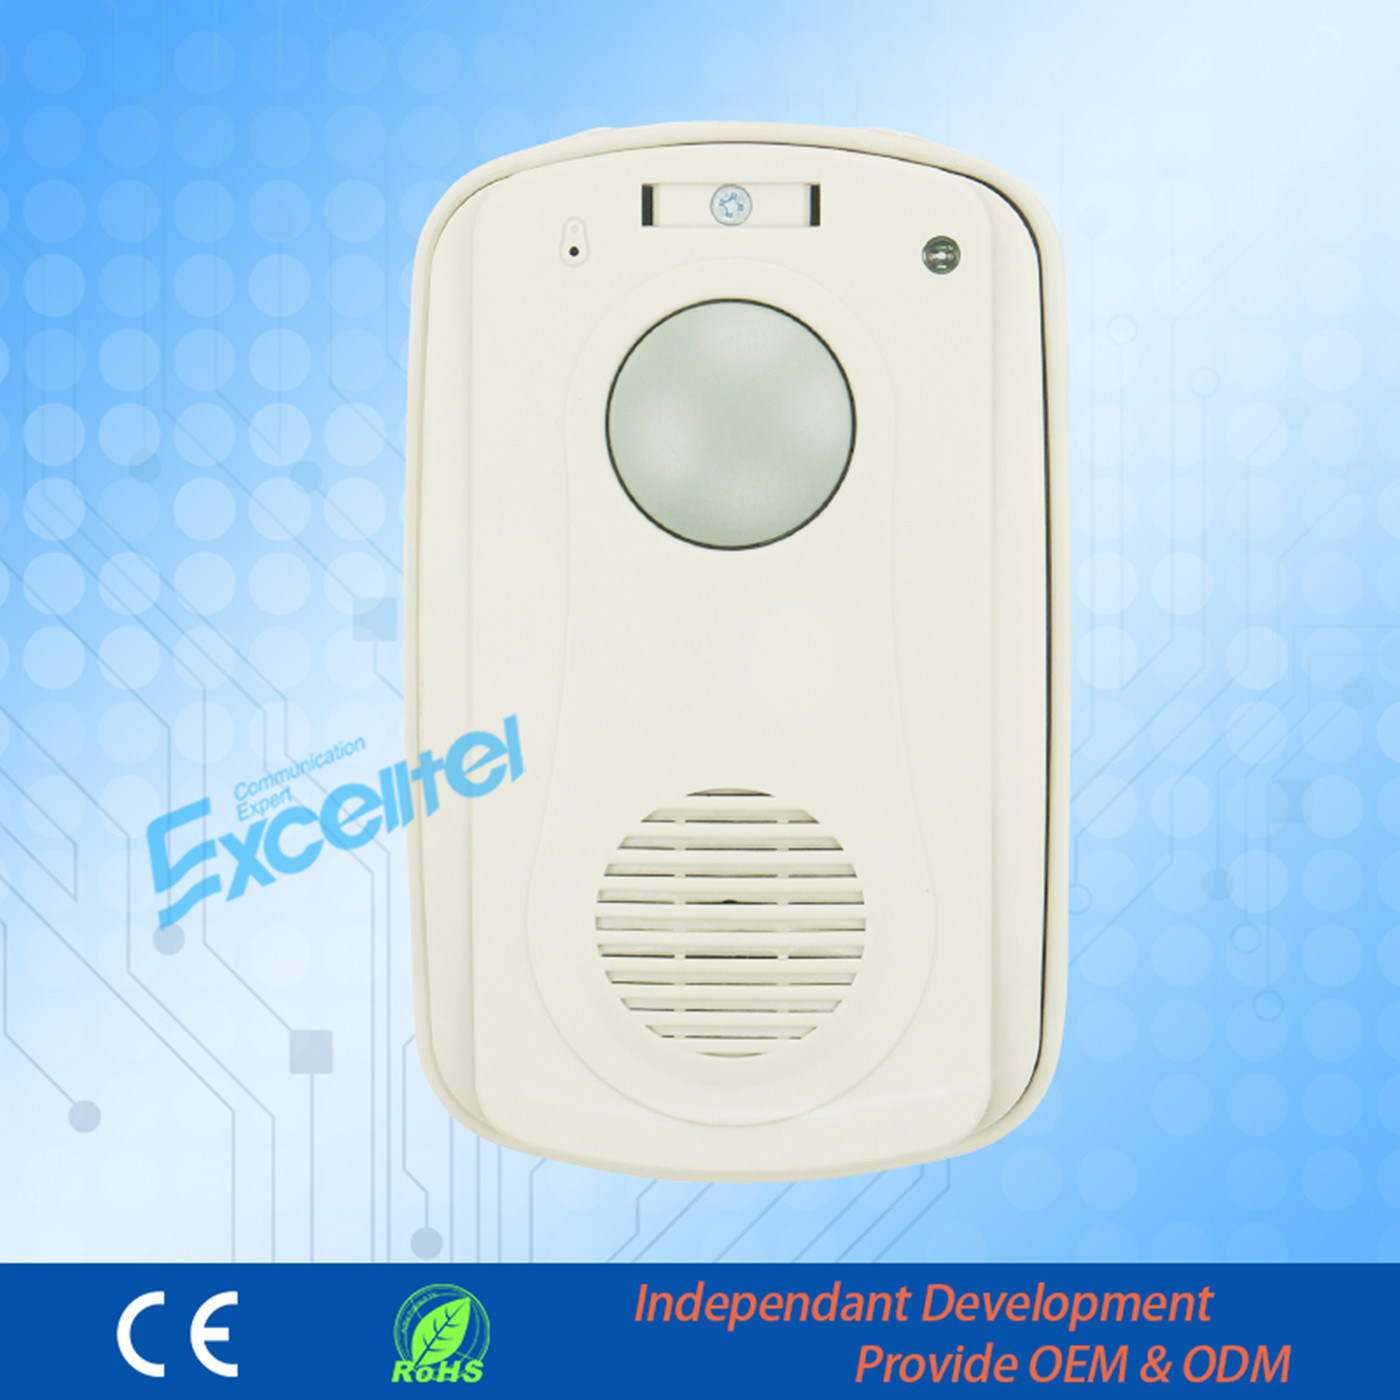 Pabx Accessory Doorphone CDX101 for Excelltel PBX